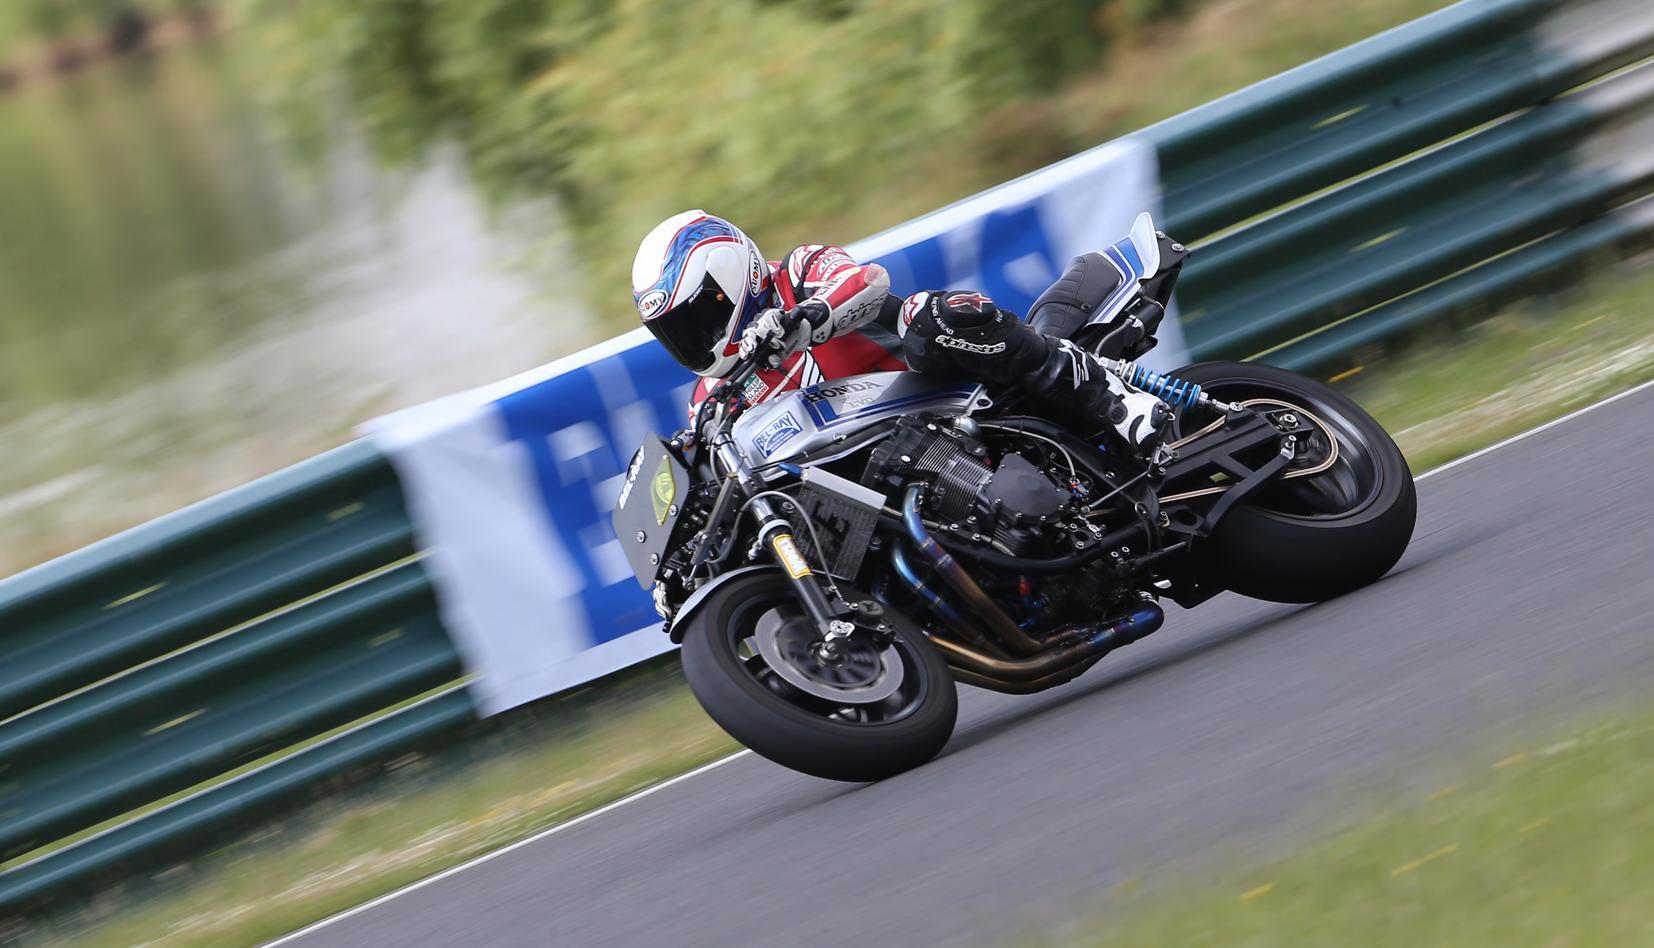 Wayne Gardner Riding Steve Elliotts Race Replica And